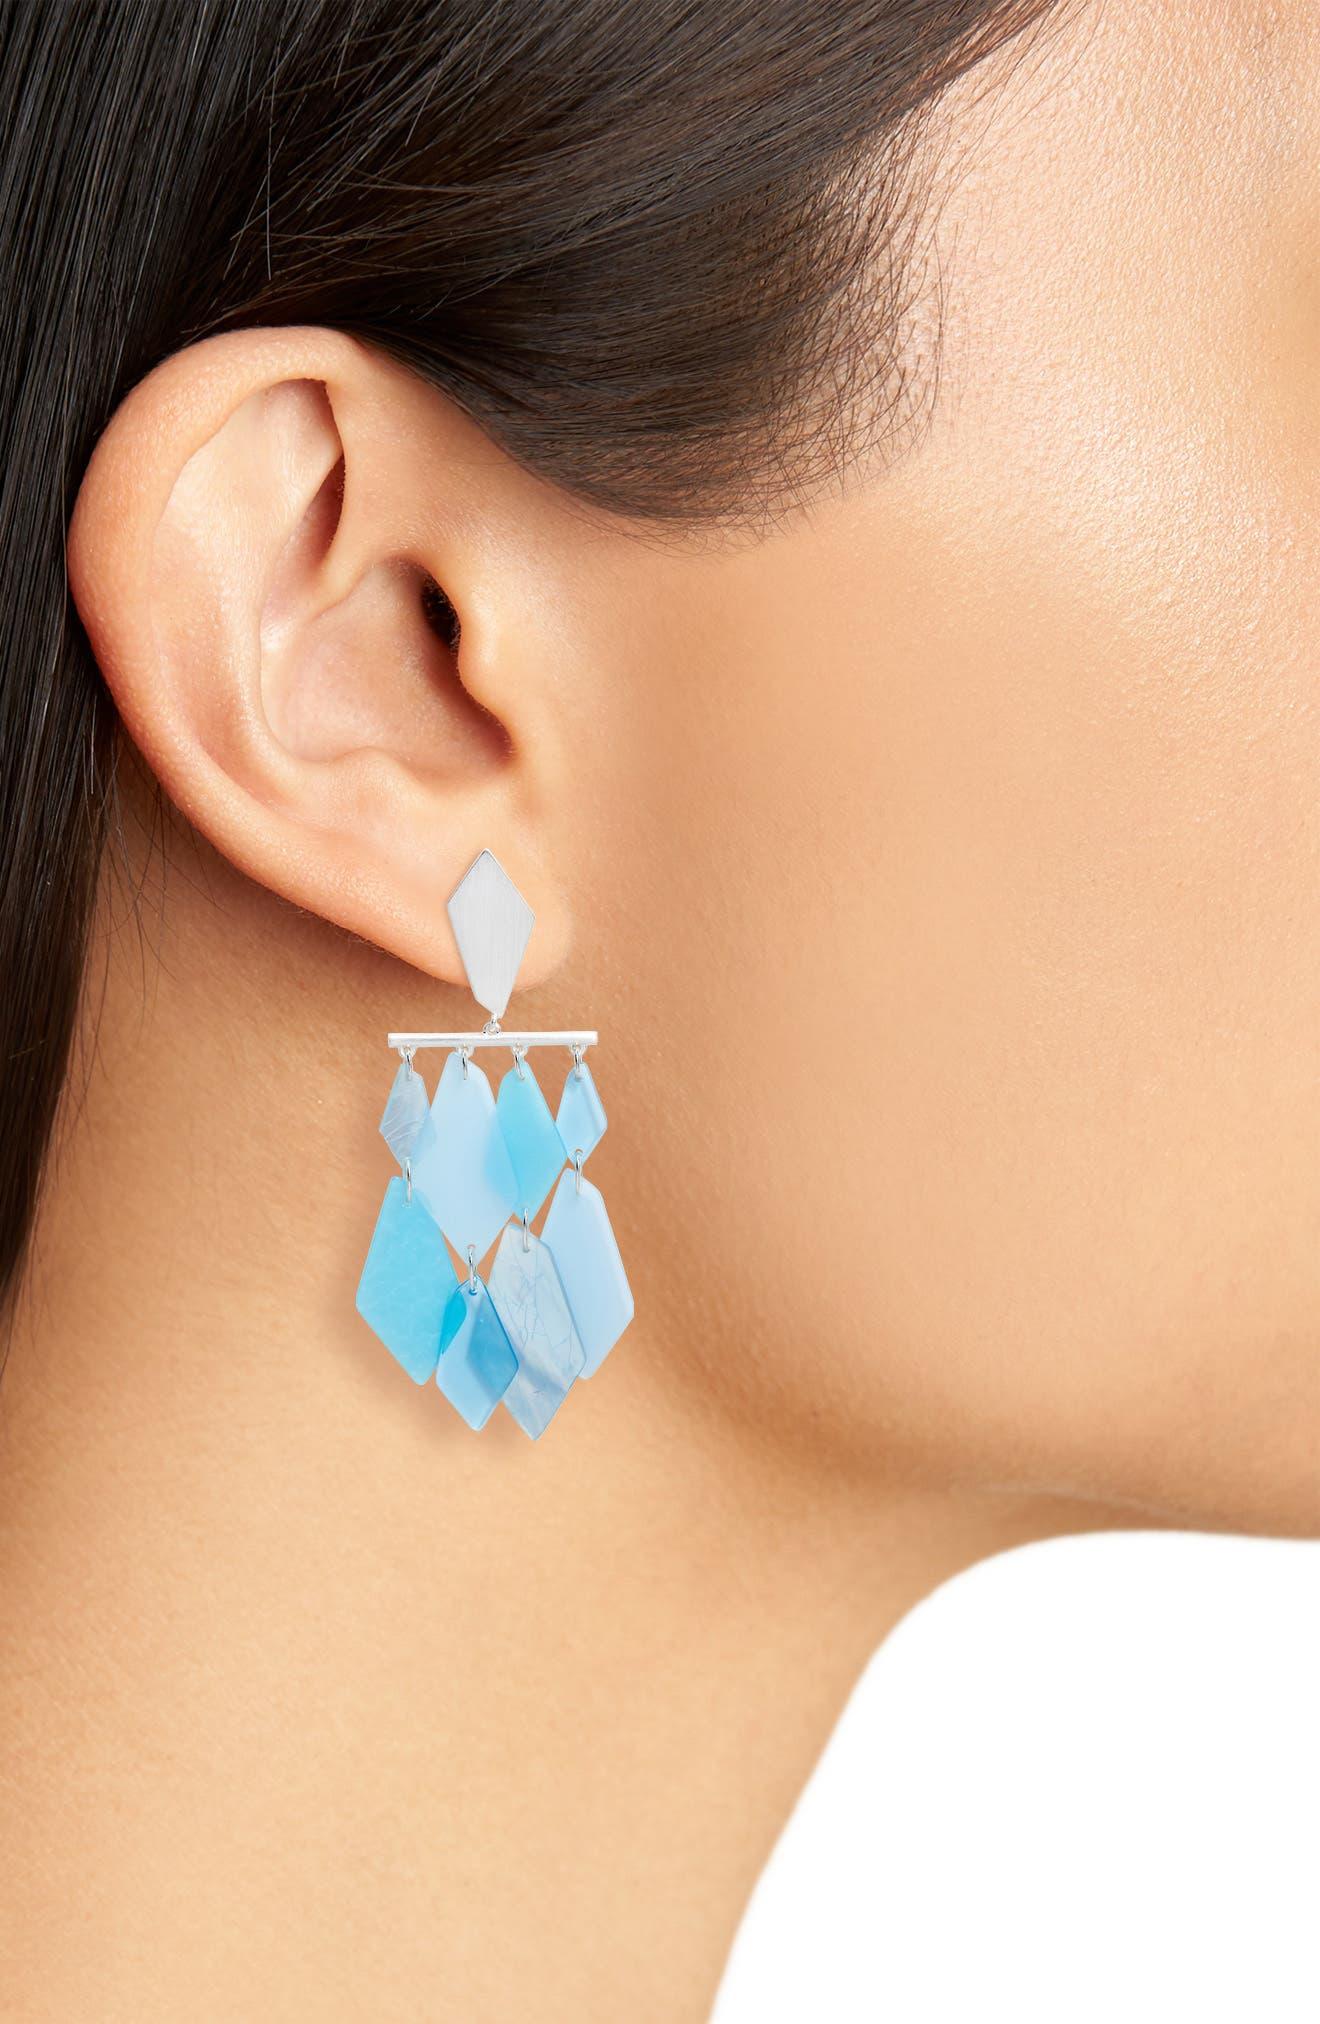 KENDRA SCOTT,                             Hanna Earrings,                             Alternate thumbnail 2, color,                             SKY BLUE MIX/ SILVER